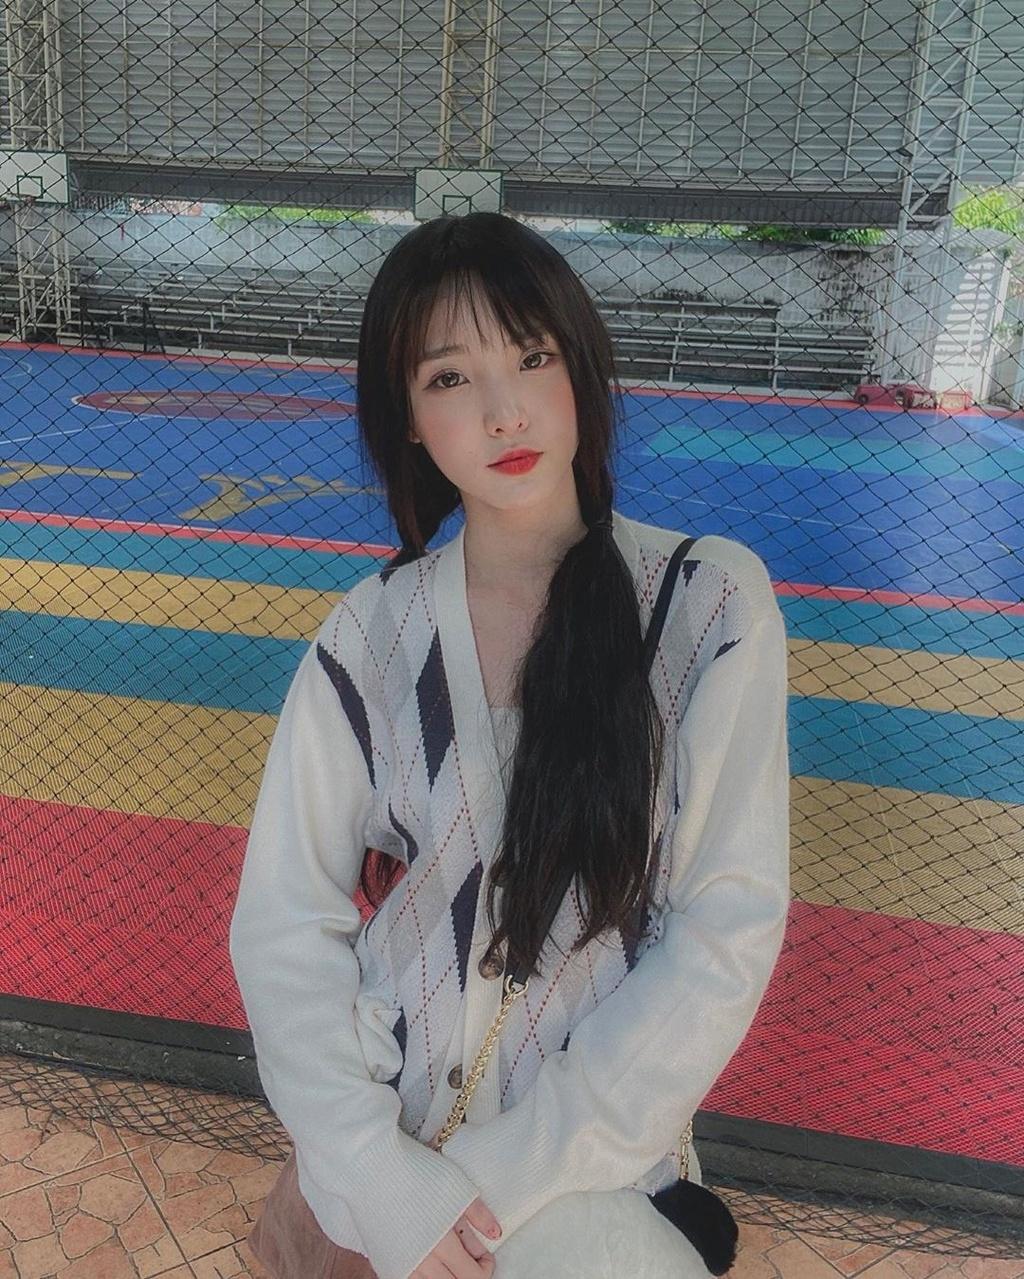 Hot girl 'Lat mat 3' cua Ly Hai tham gia show song con ban Trung hinh anh 4 72399926_360945221337765_387202567735975492_n.jpg